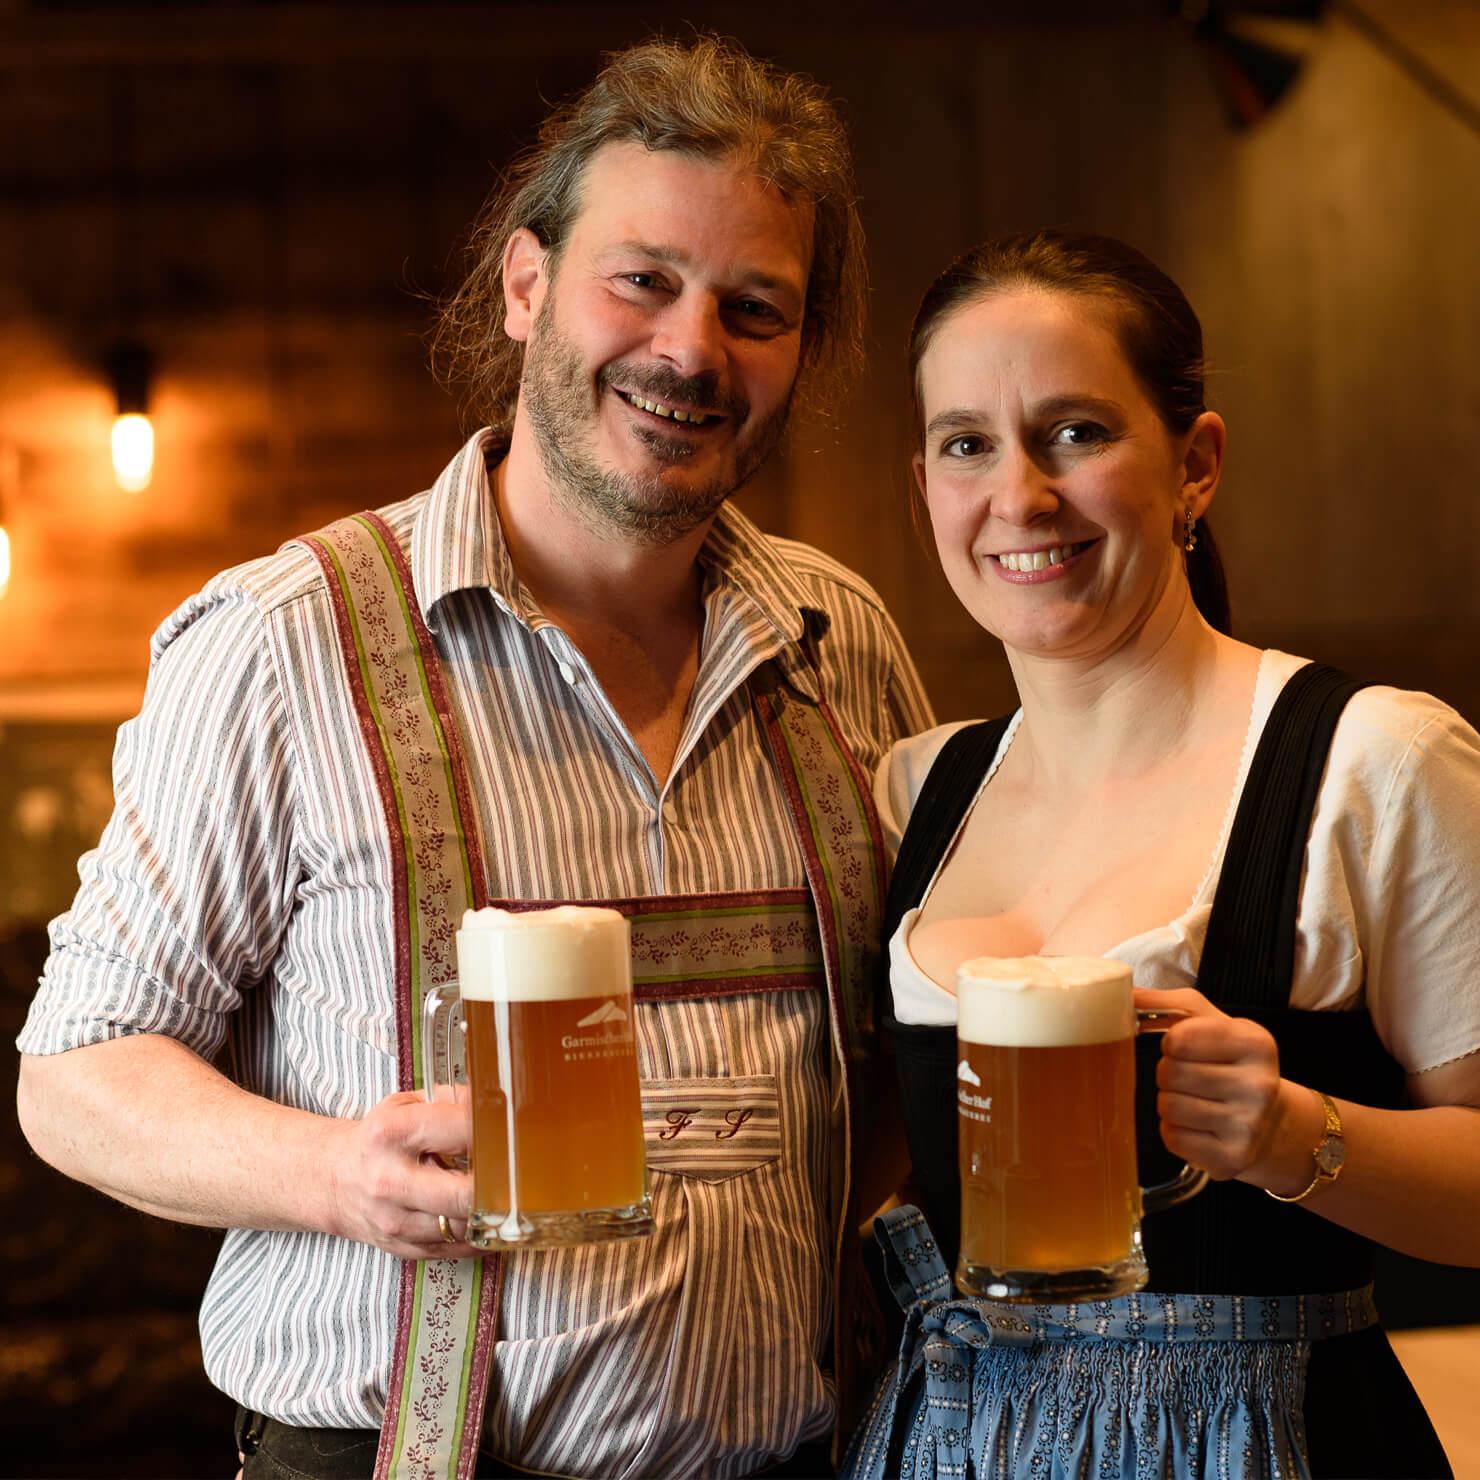 Garmischer Hof Bierbrauerei Gastgeber